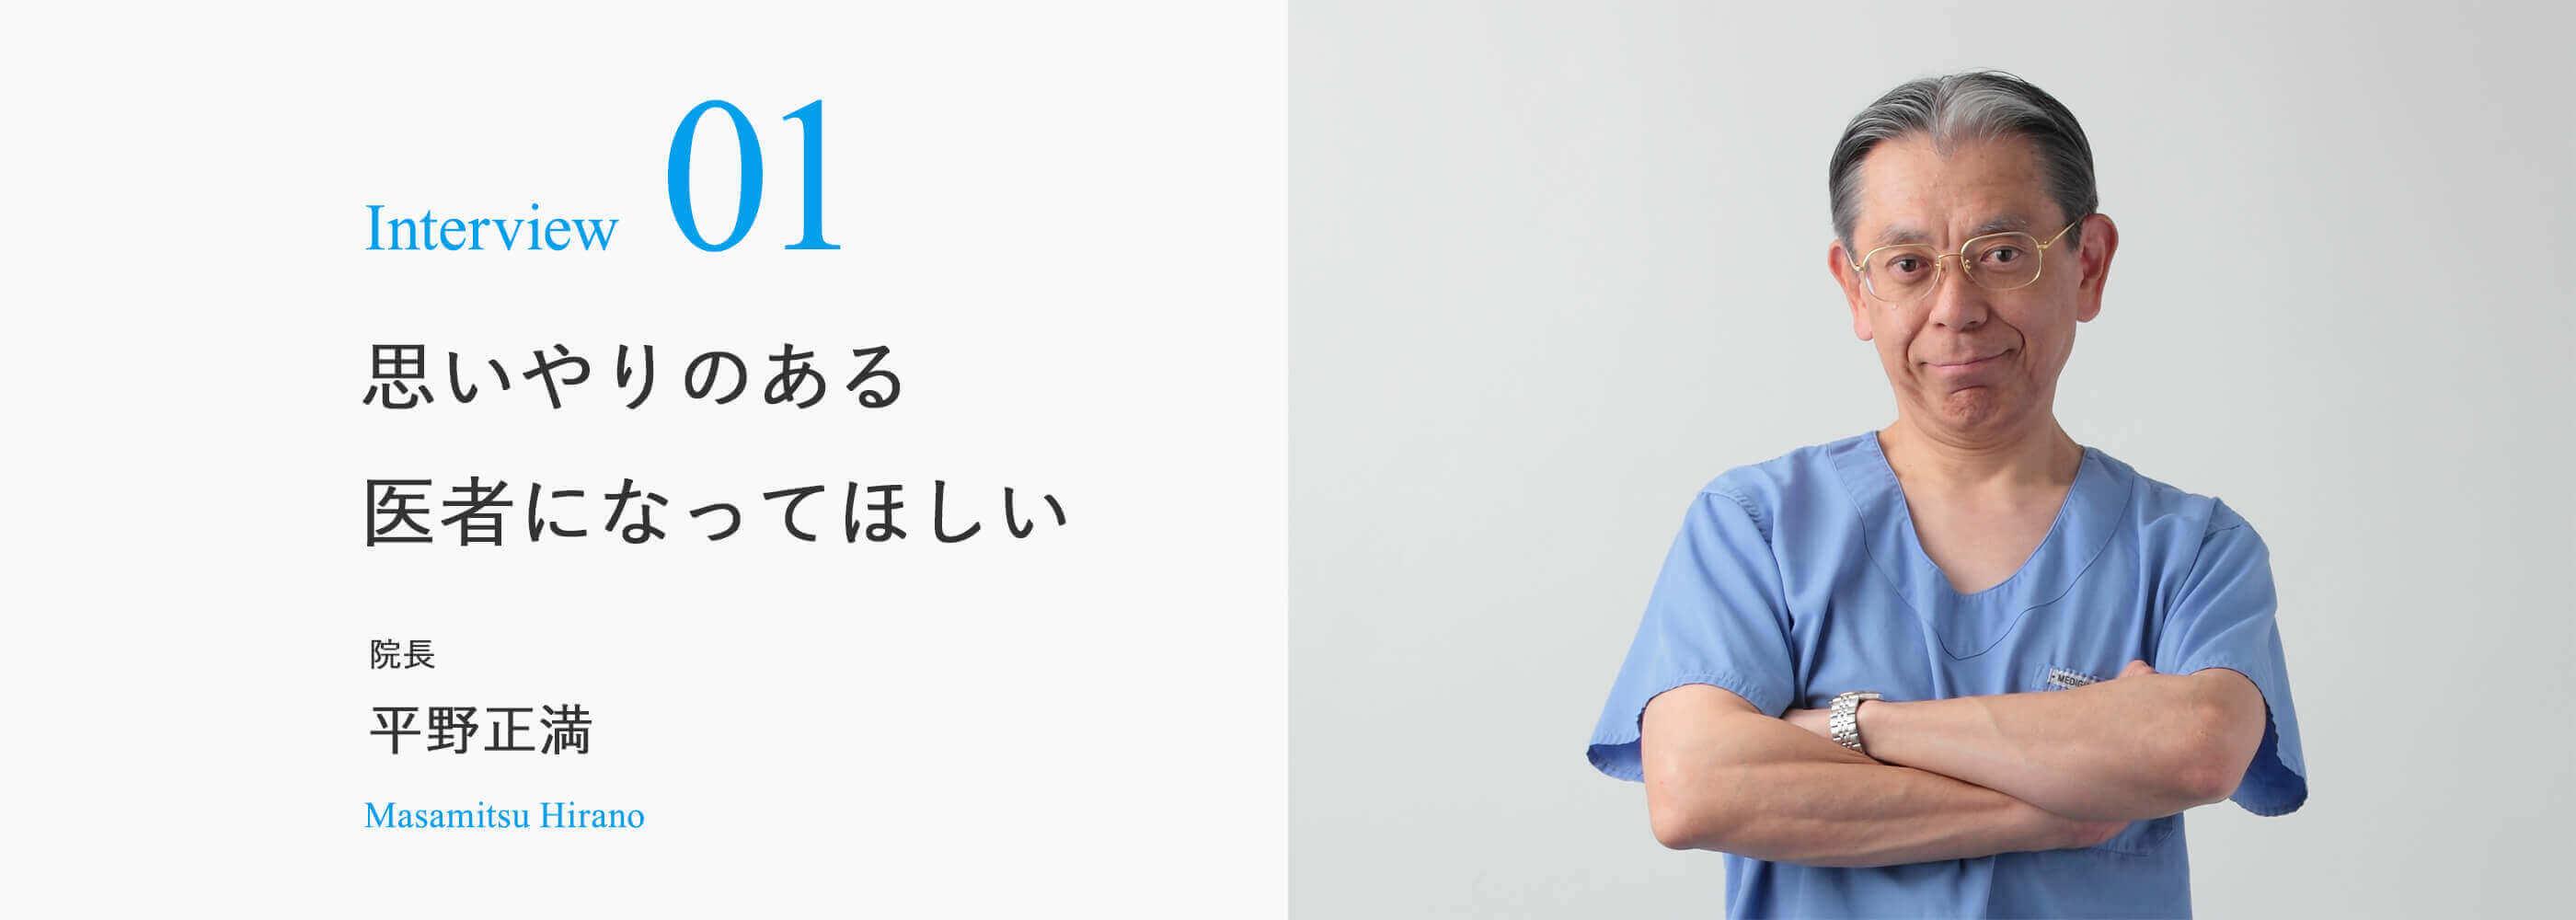 Interview 01 思いやりのある医者になってほしい 院長 平野正満